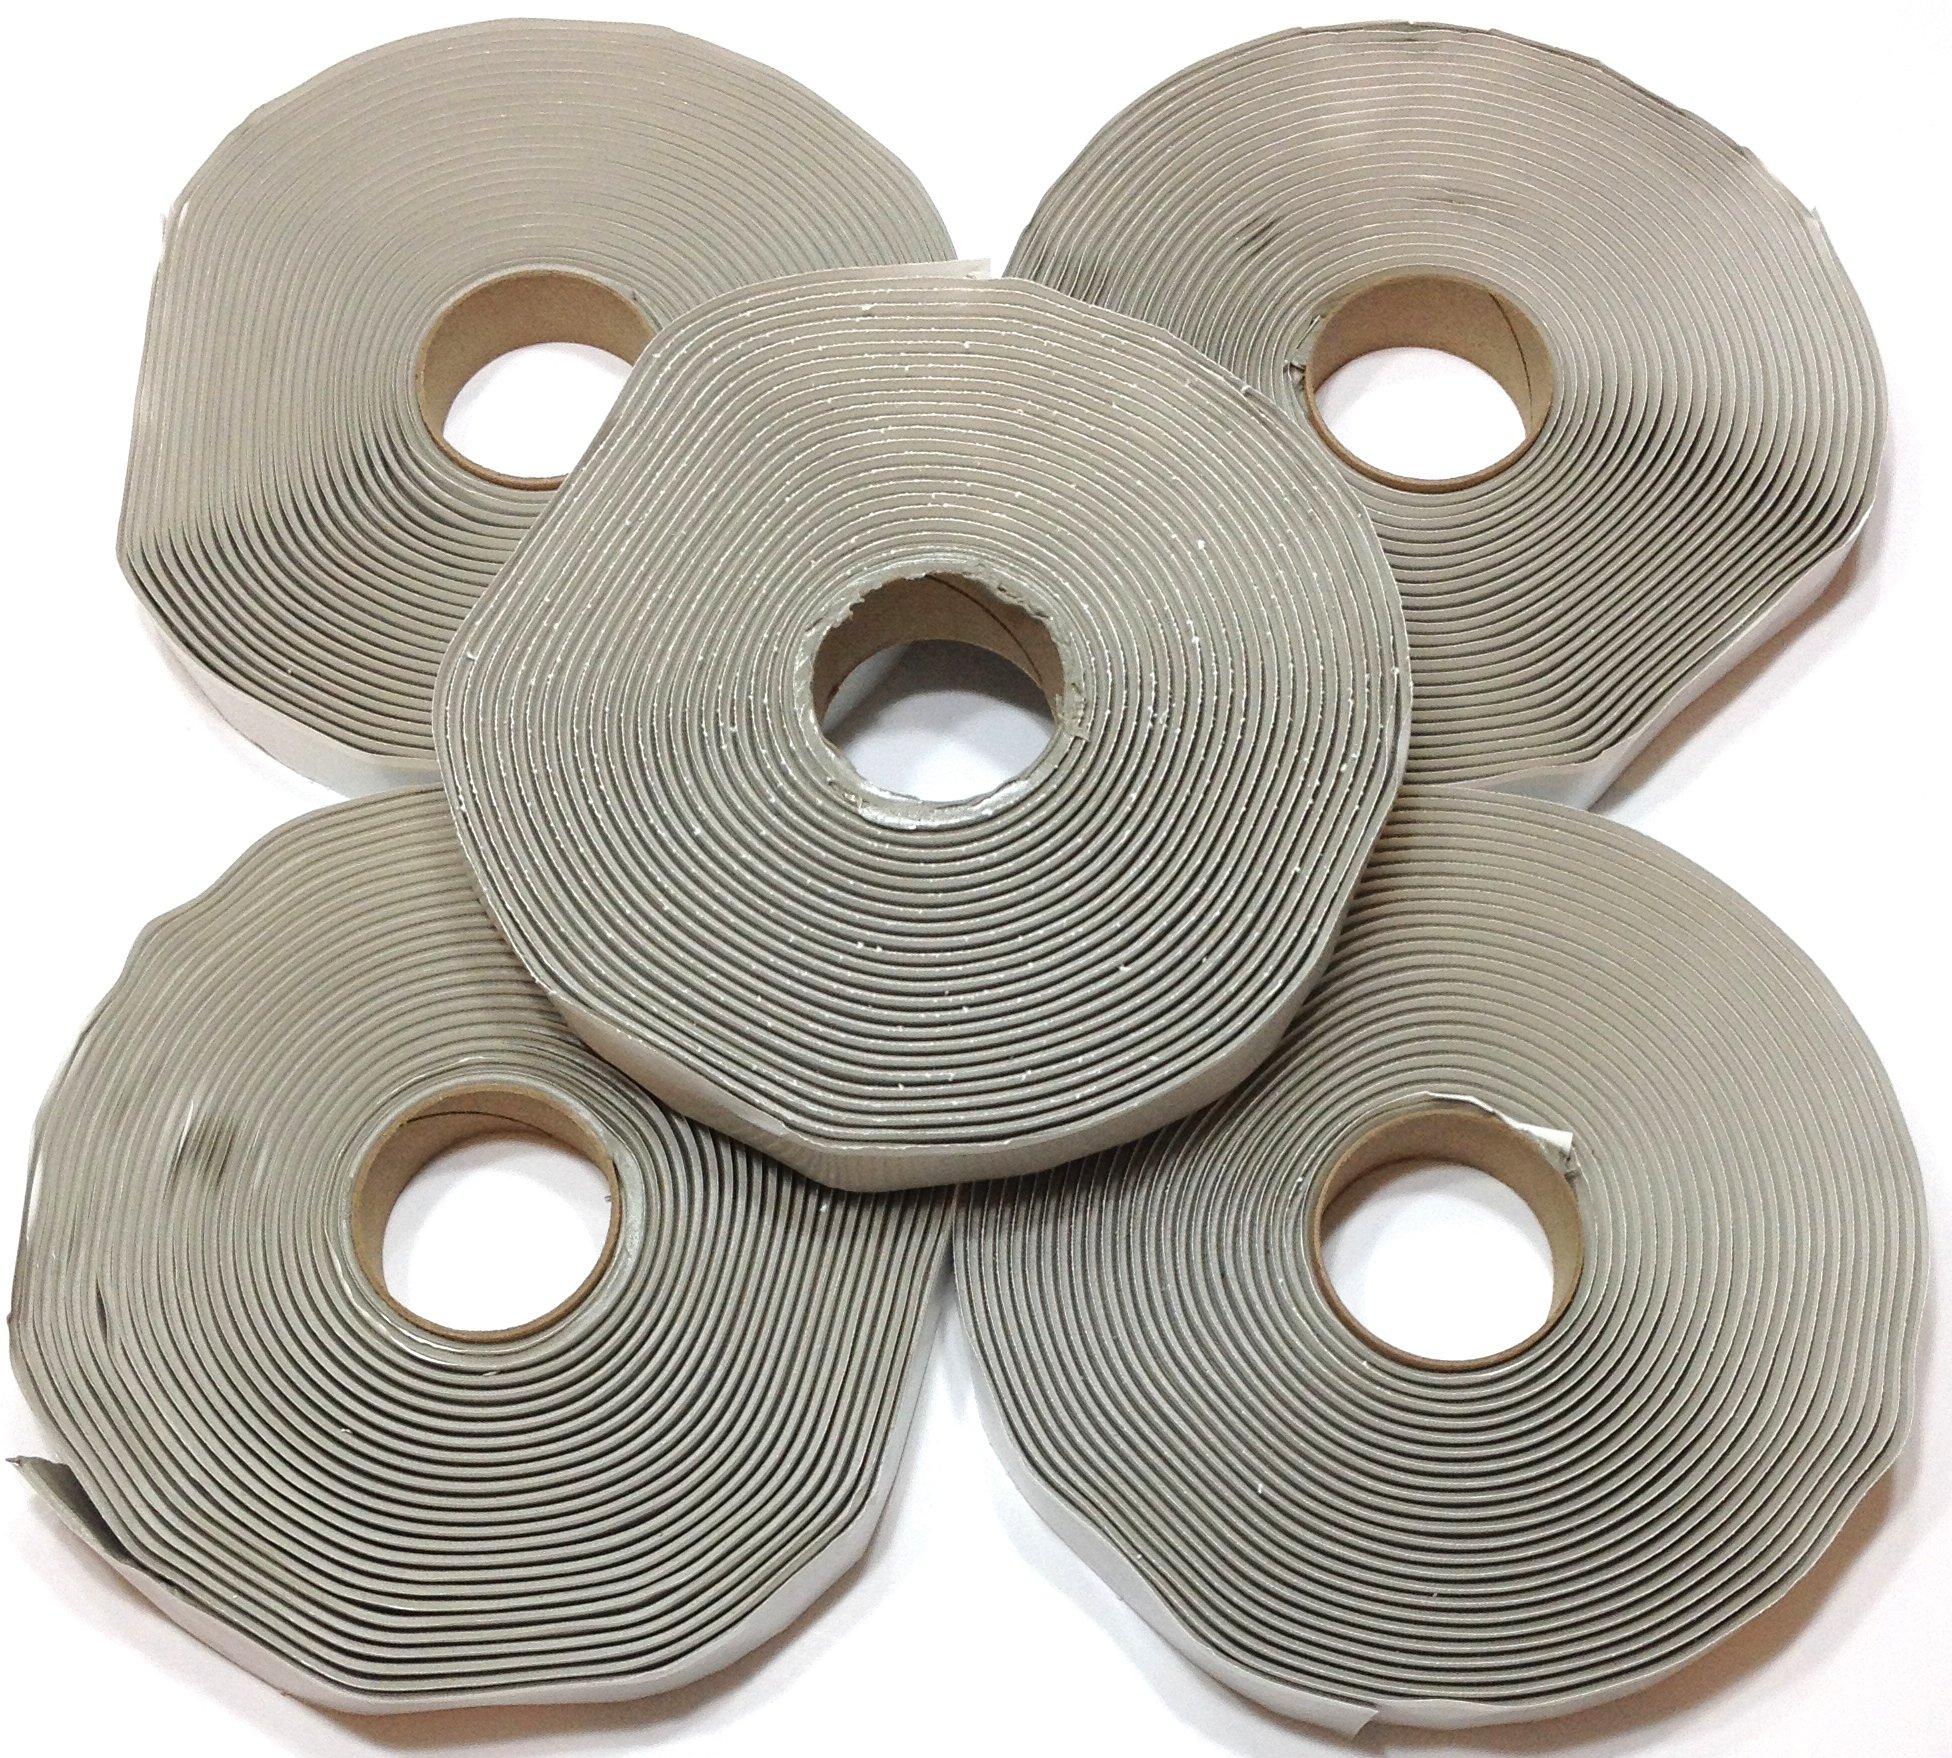 Colorimetrics Gray Putty Tape / Butyl Tape 1/8'' x 3/4'' x 30' (5-Pack)